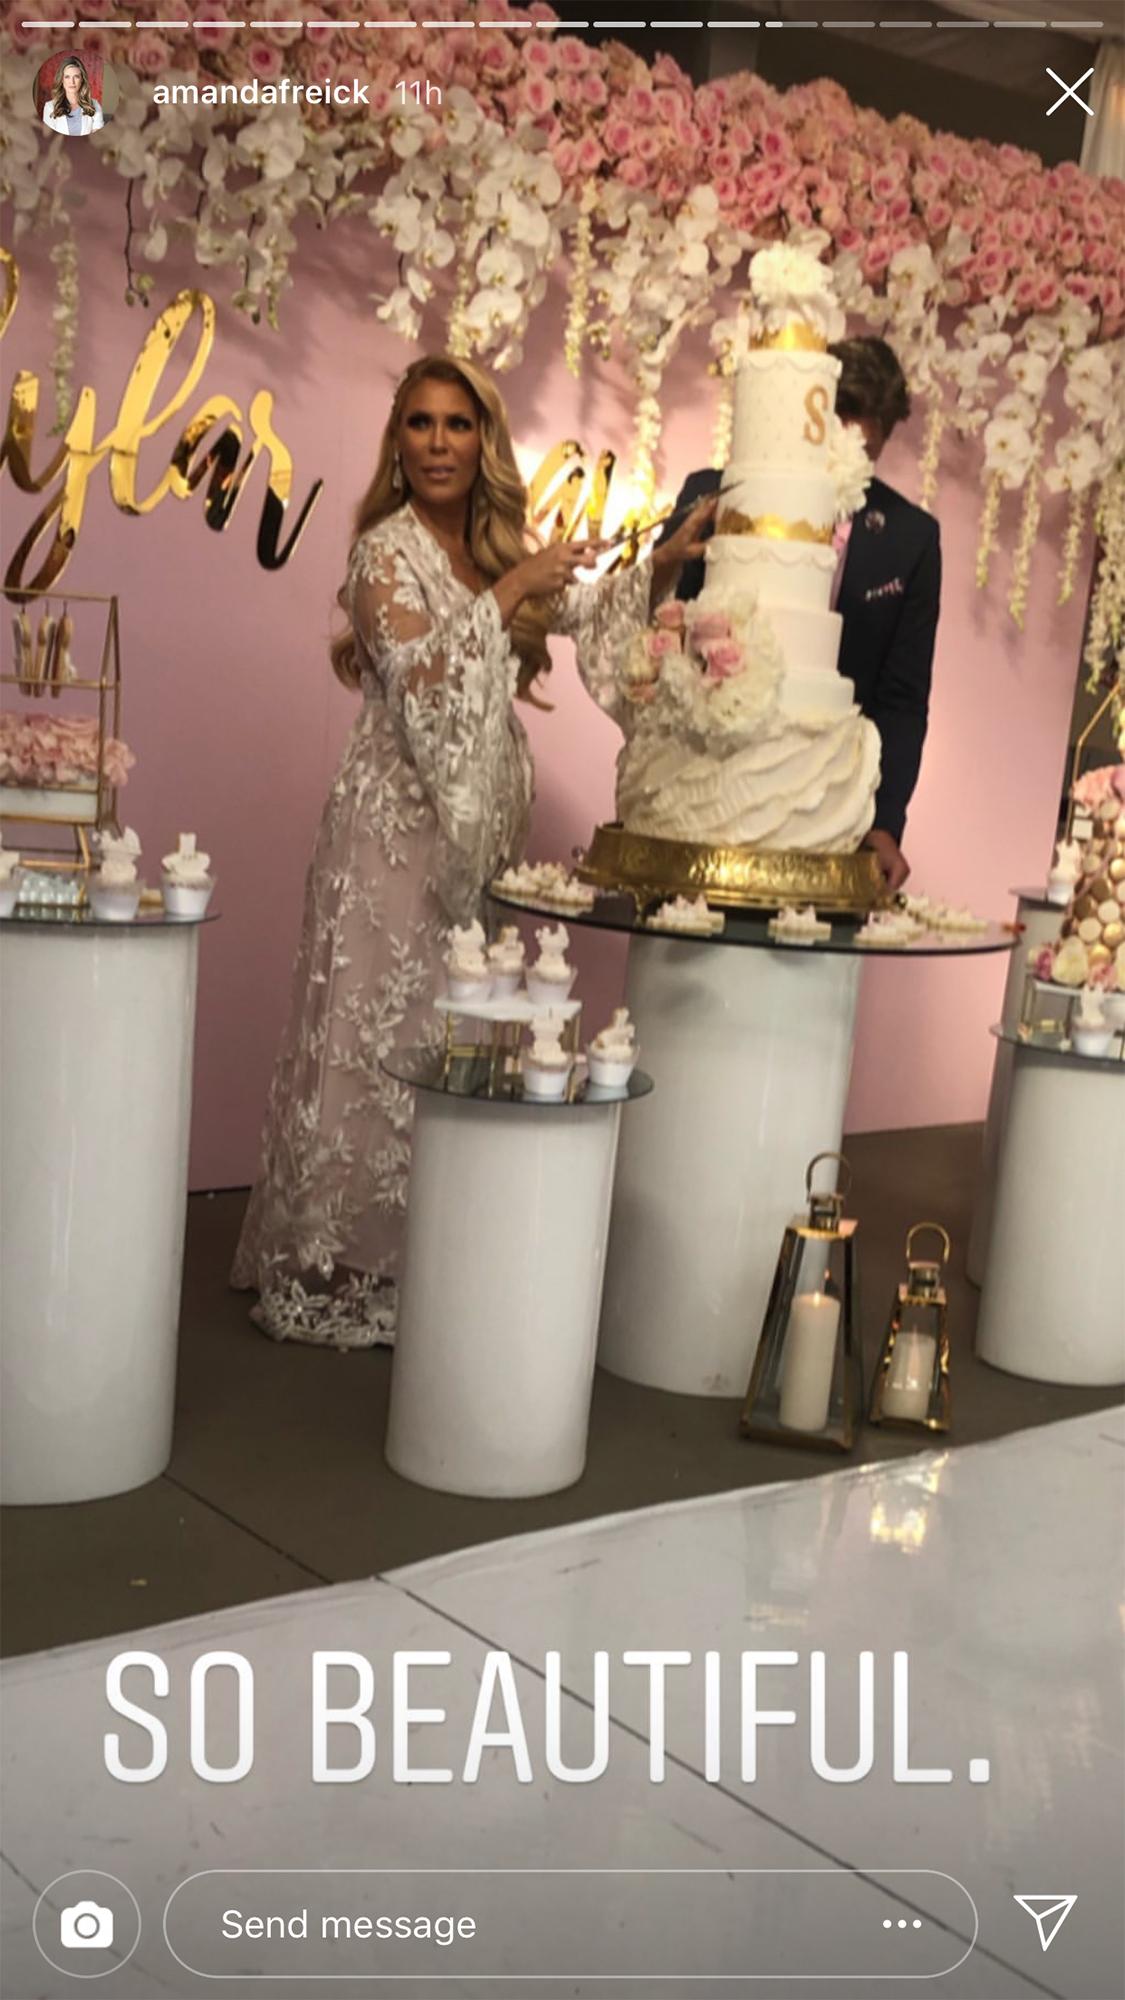 Gretchen Rossi Celebrates Baby Shower - Dessert is served, thanks to Rossi!